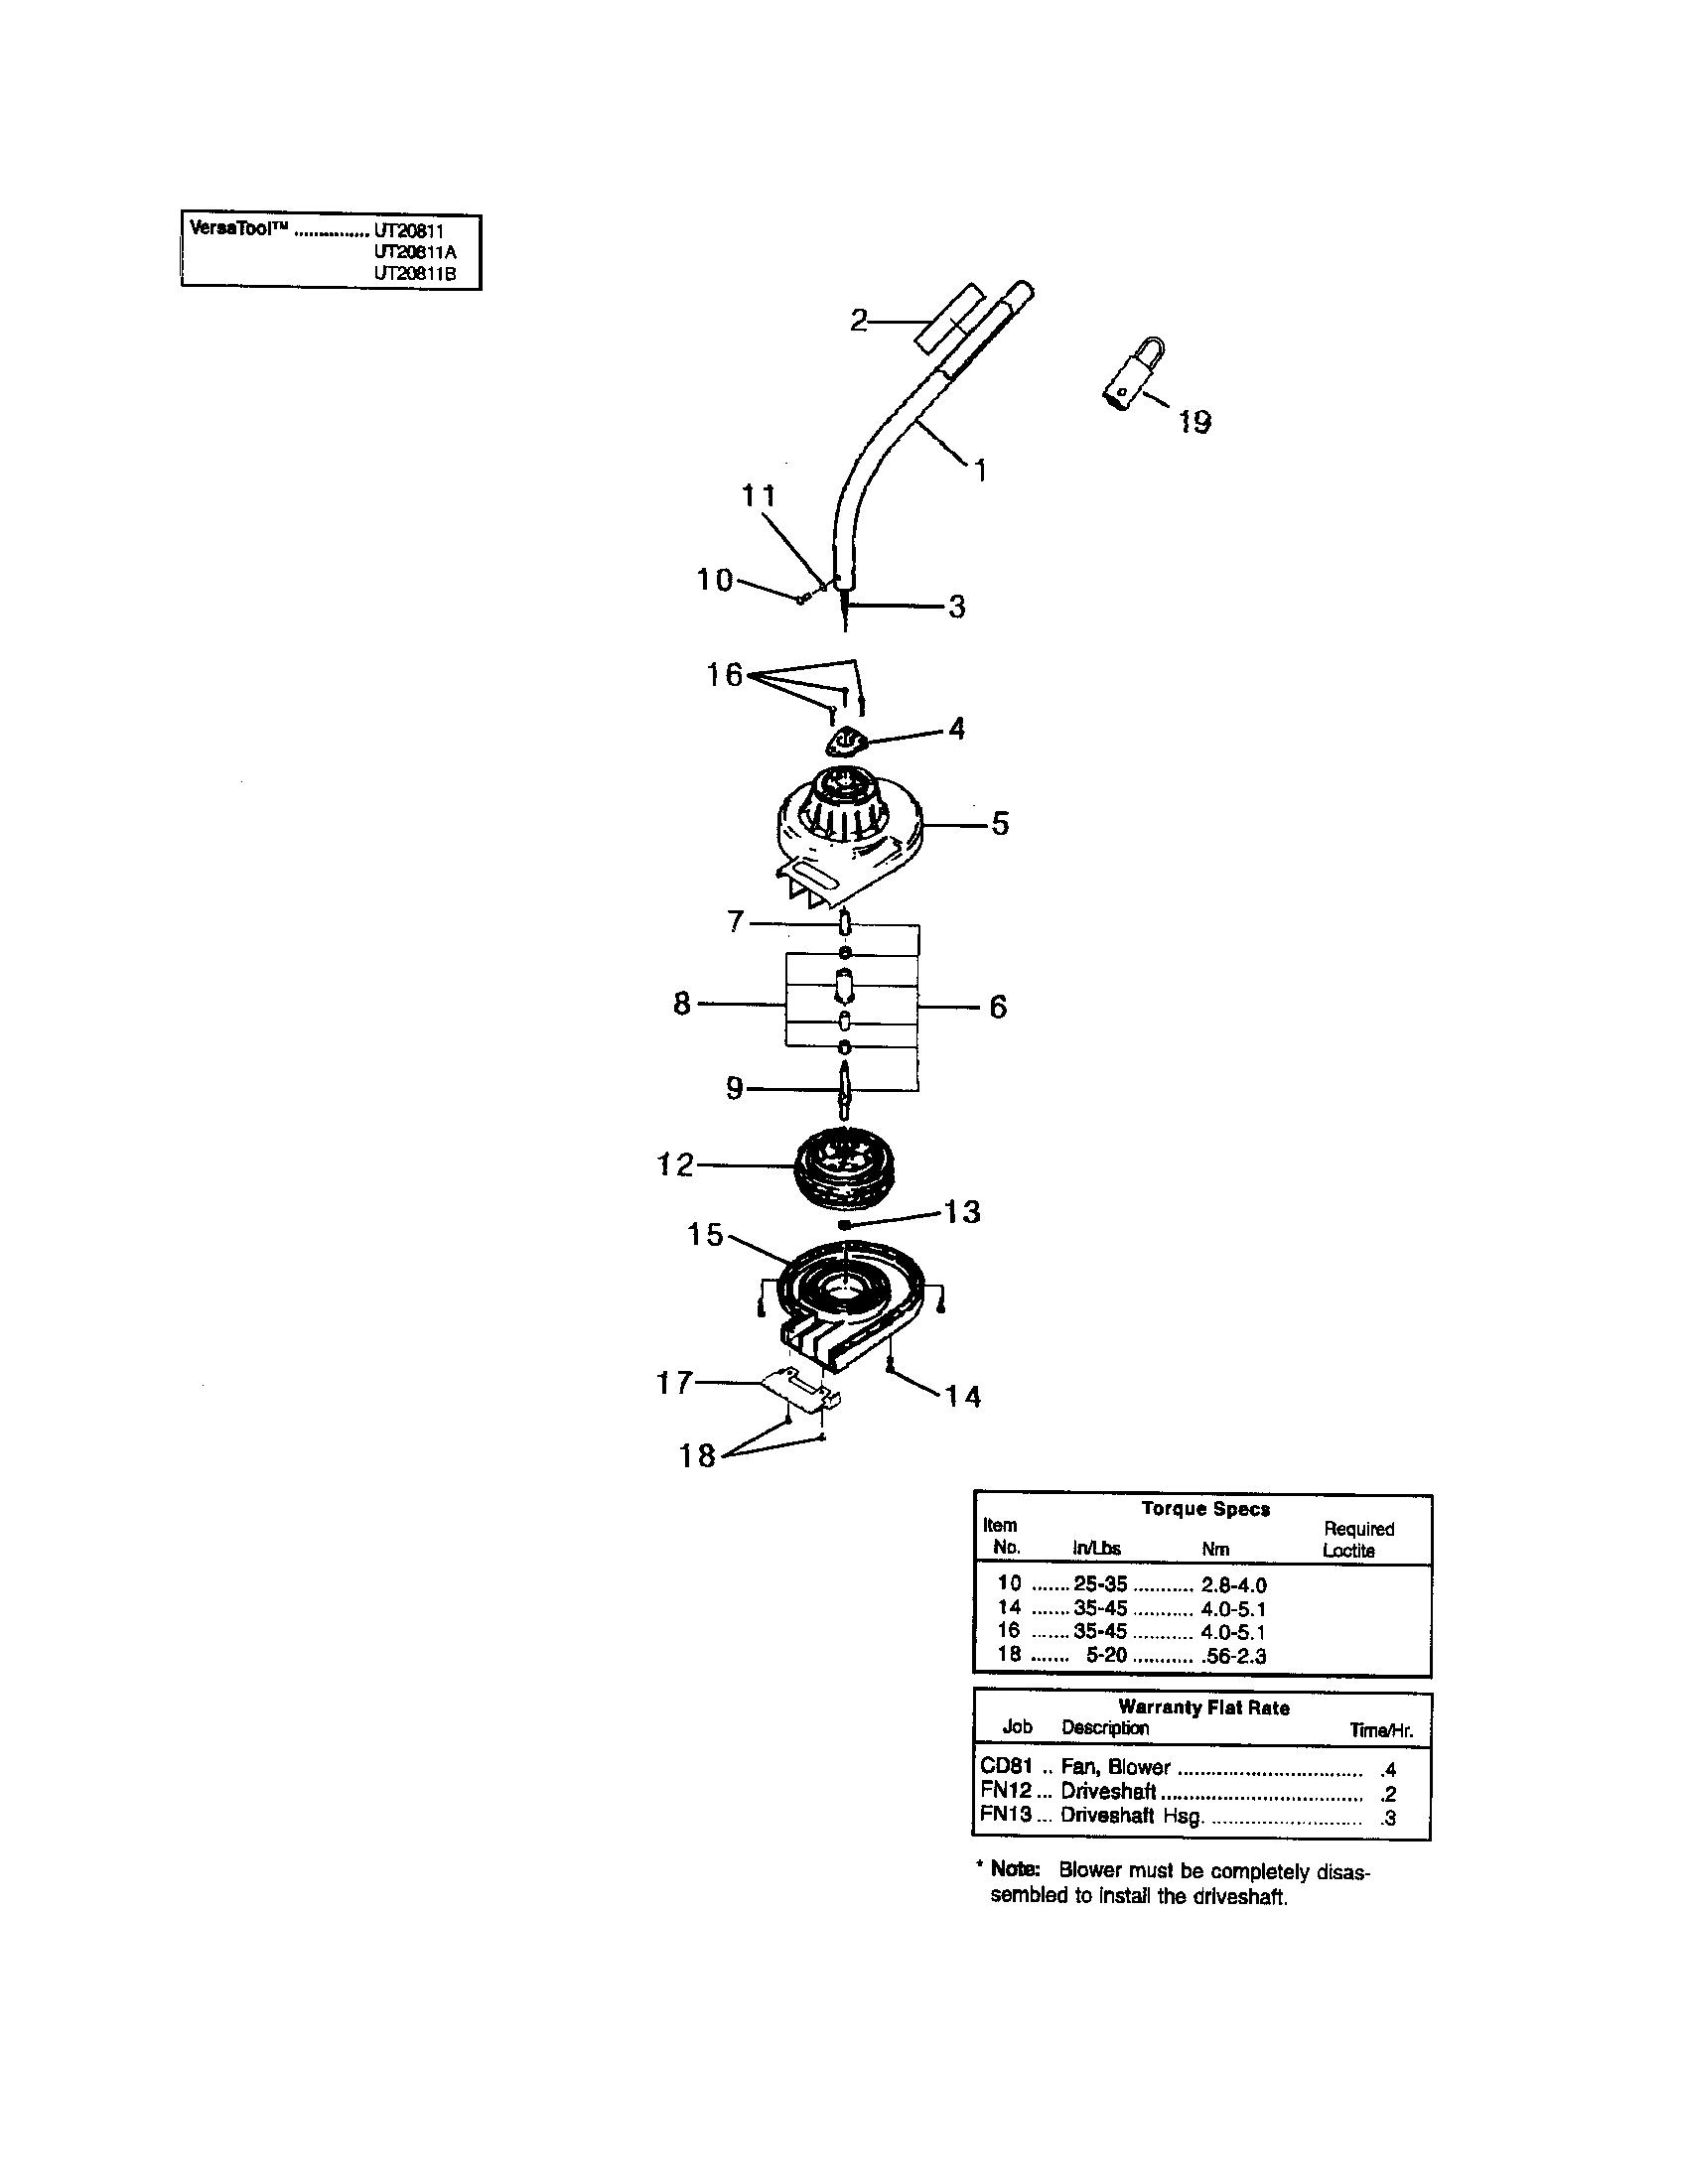 Homelite model UT20811B line trimmers/weedwackers, gas